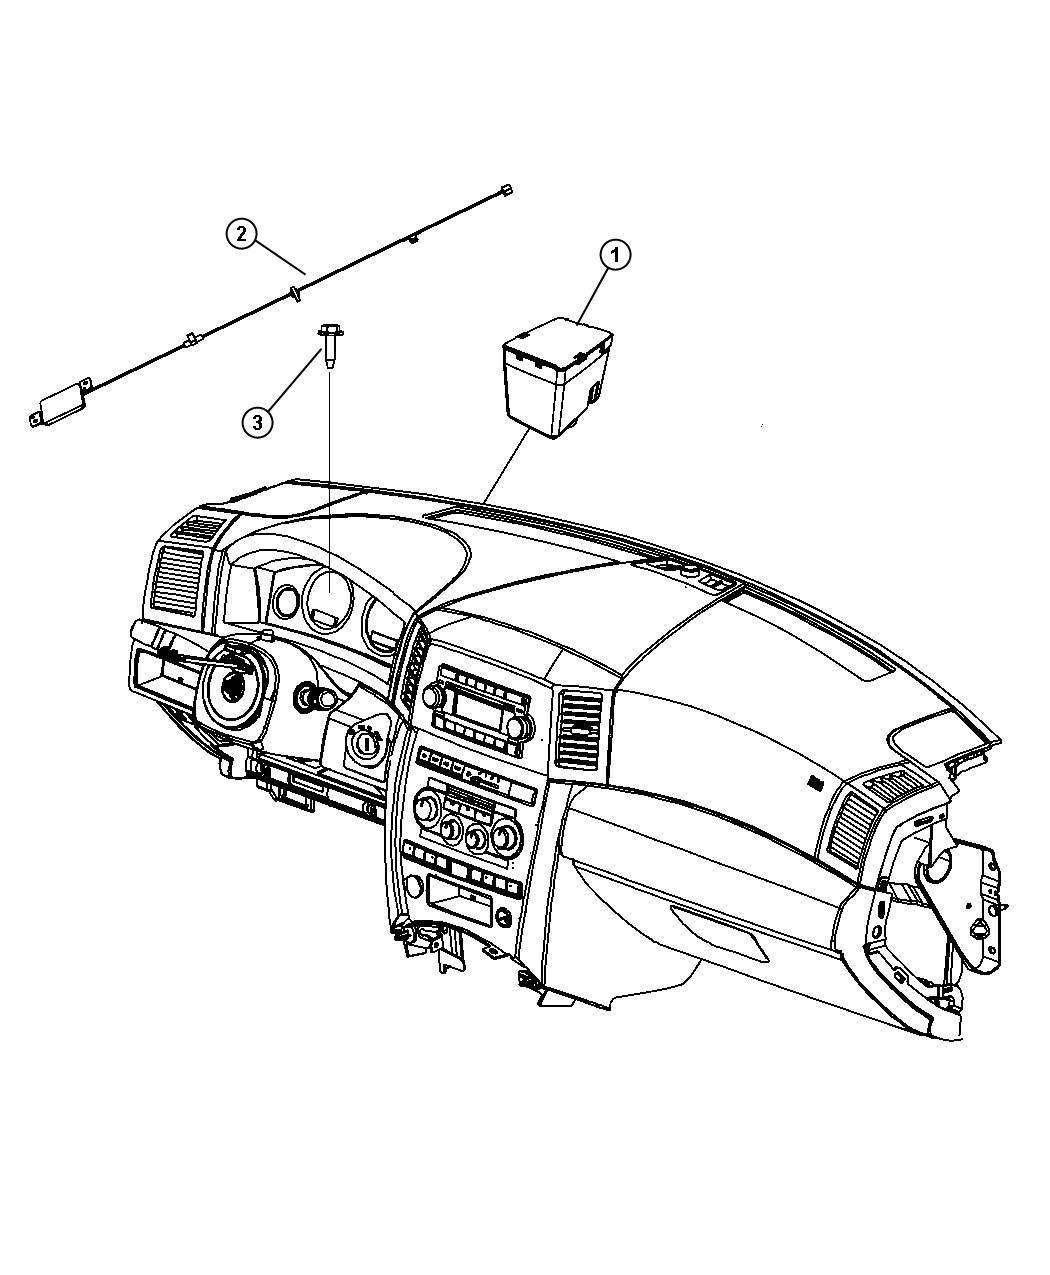 Chrysler 300 Receiver Export Wireless Ignition Node